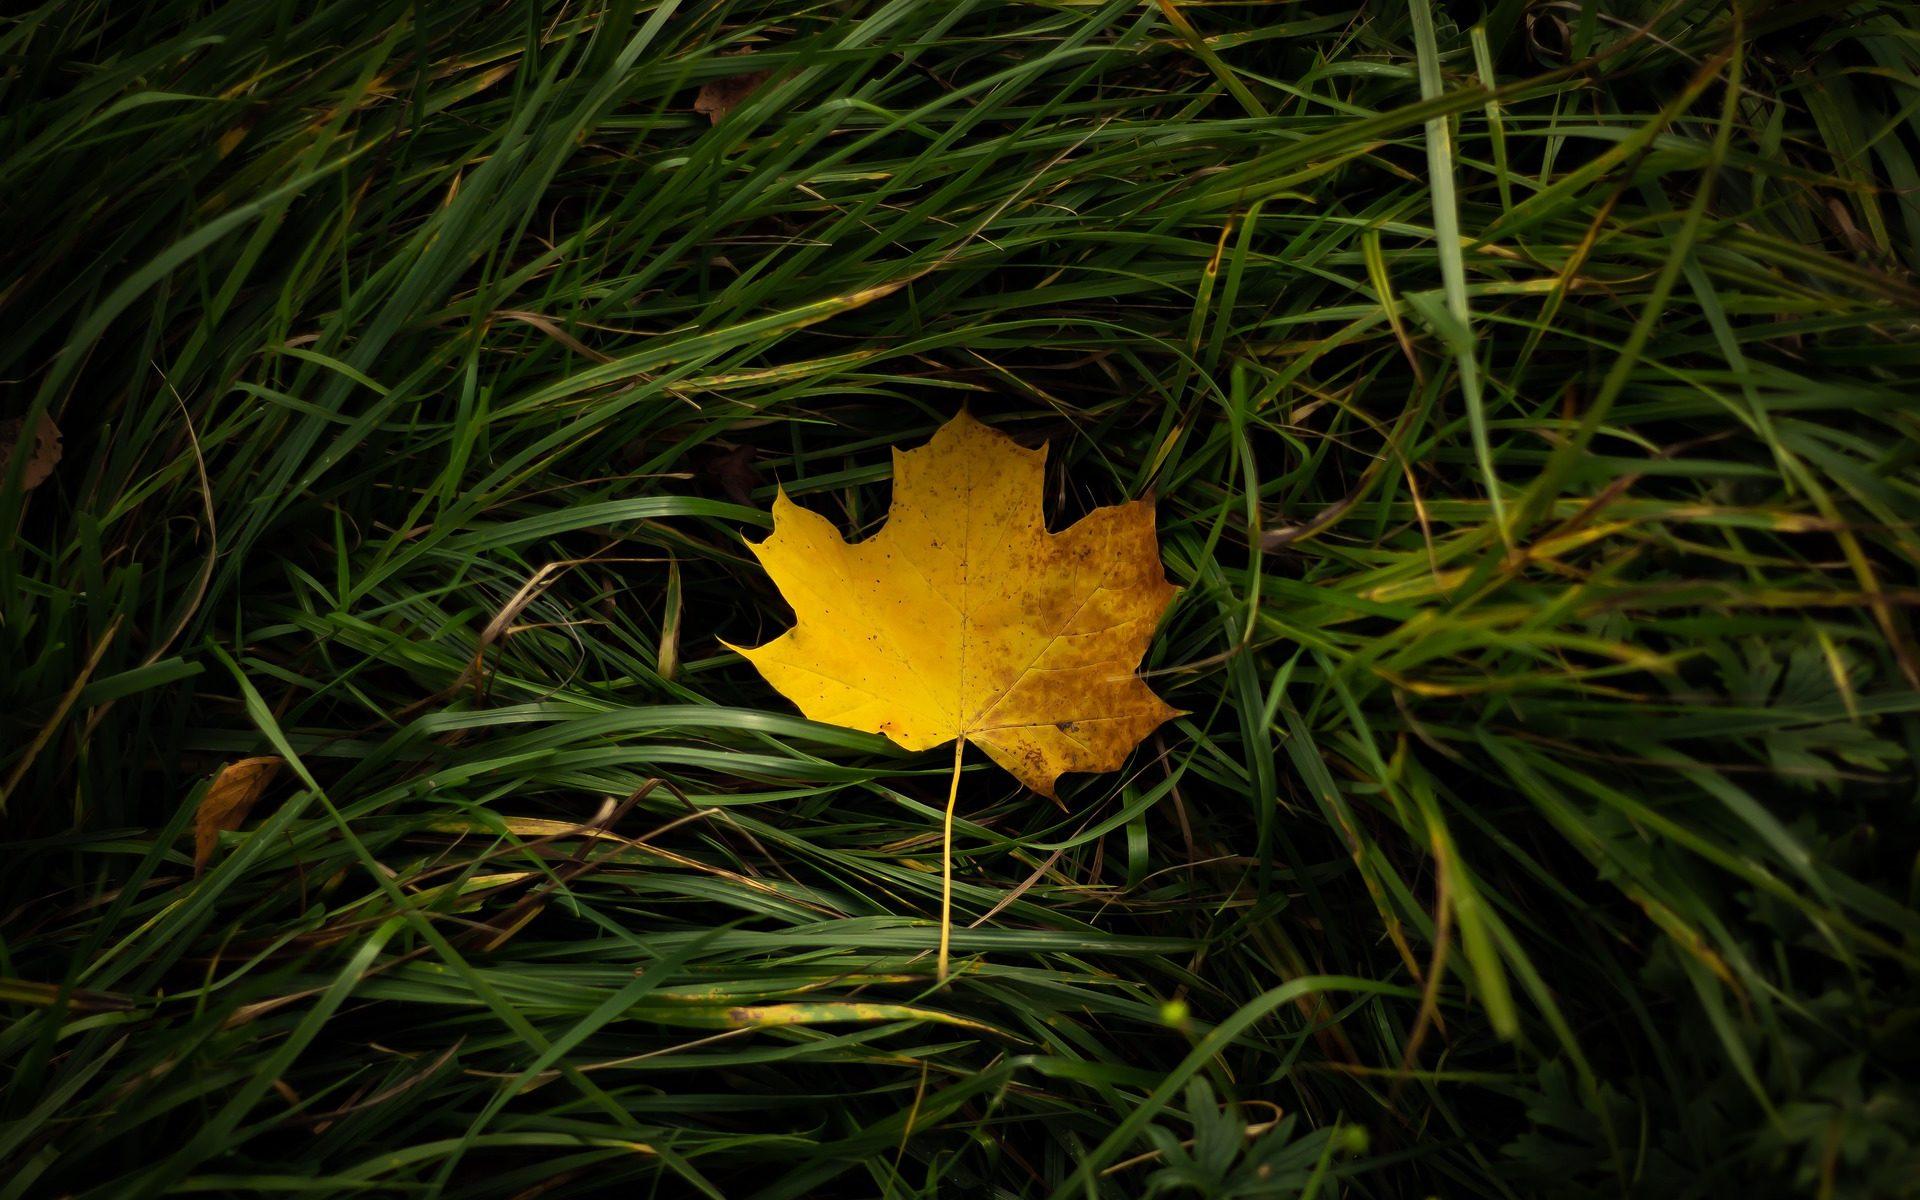 Feuille d'automne sur herbe verte